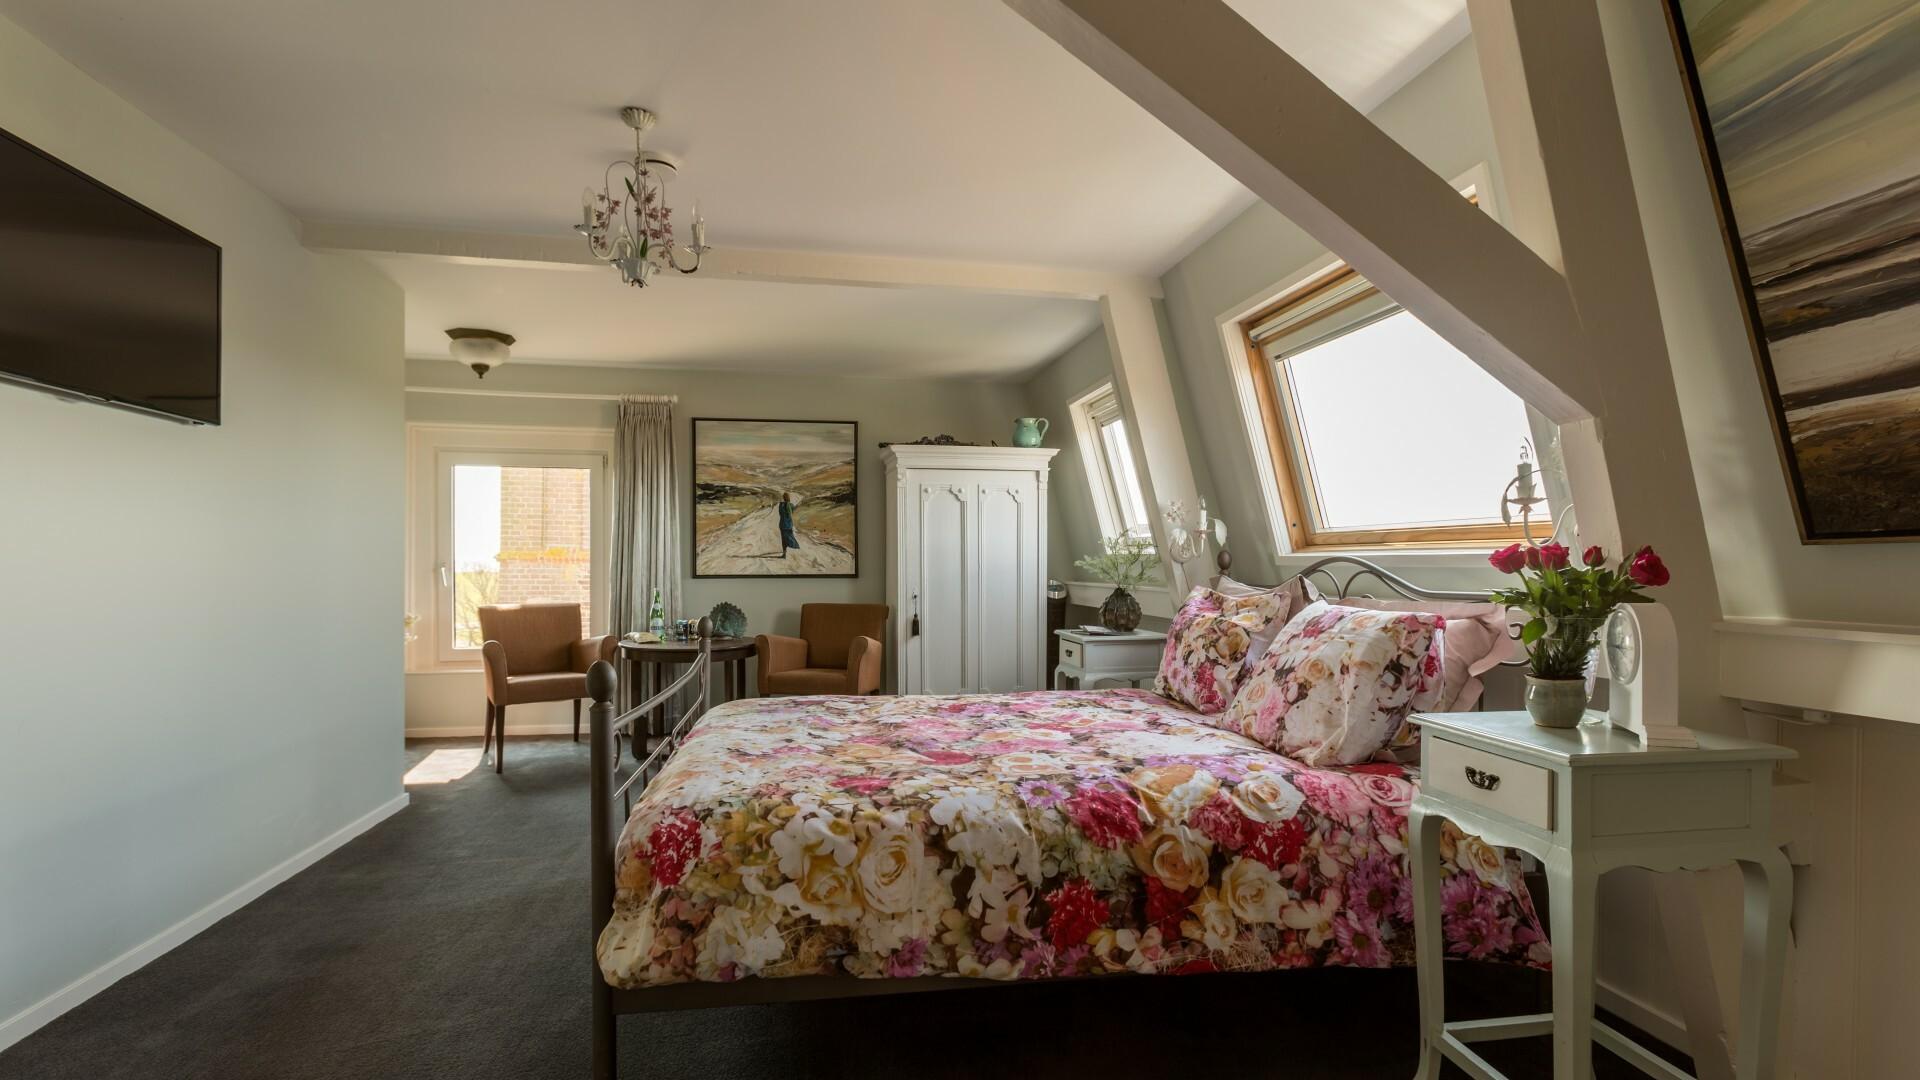 Slaapkamer Stella bed en breakfast Pastorie Marie VVV Texel